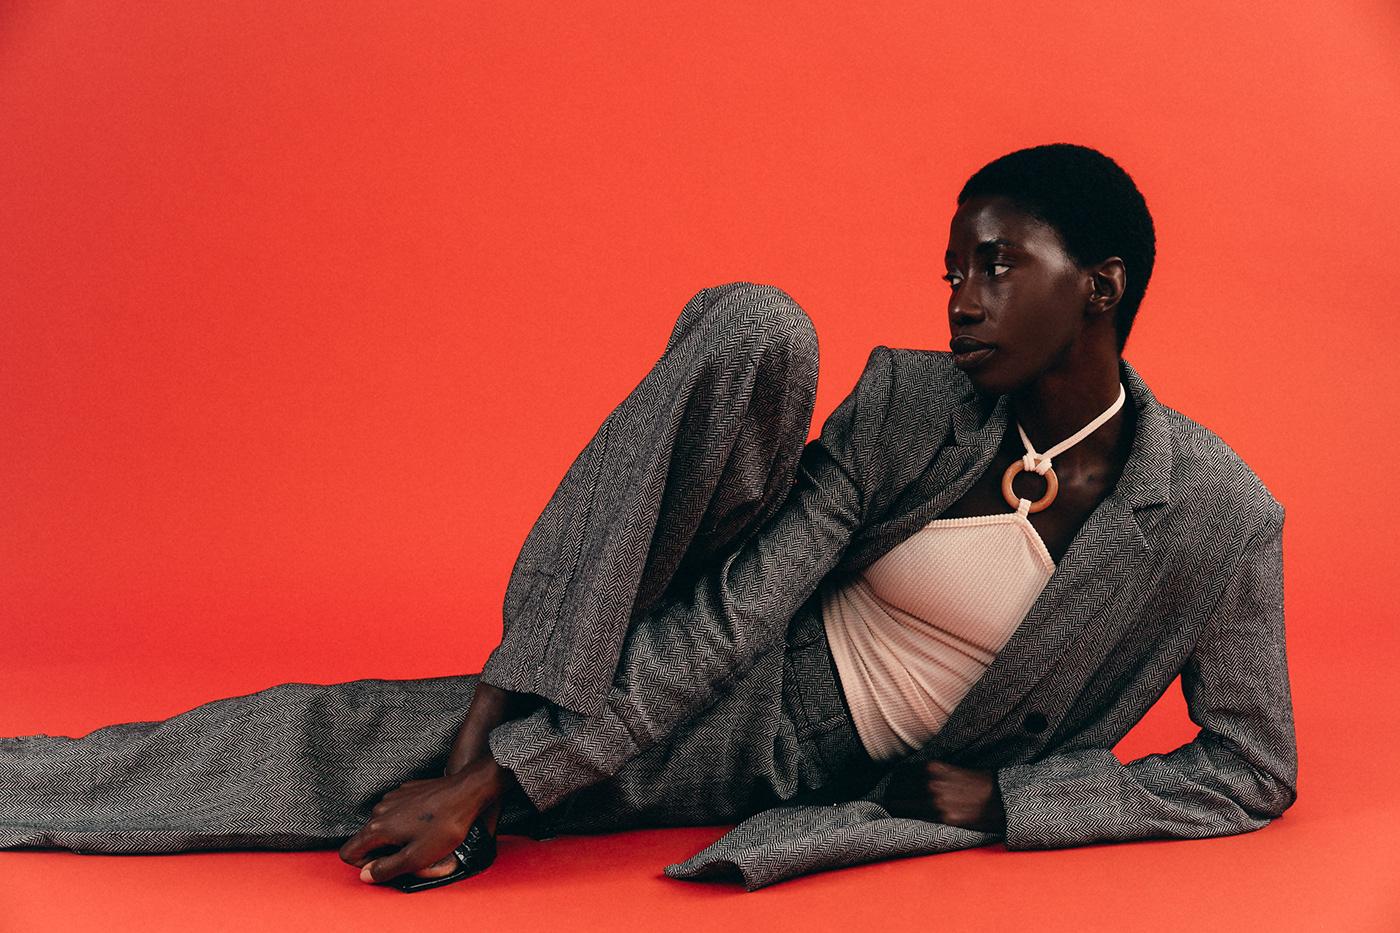 editorial Editorial Photogrpahy Female Model model New York portrait studio Studio Photography